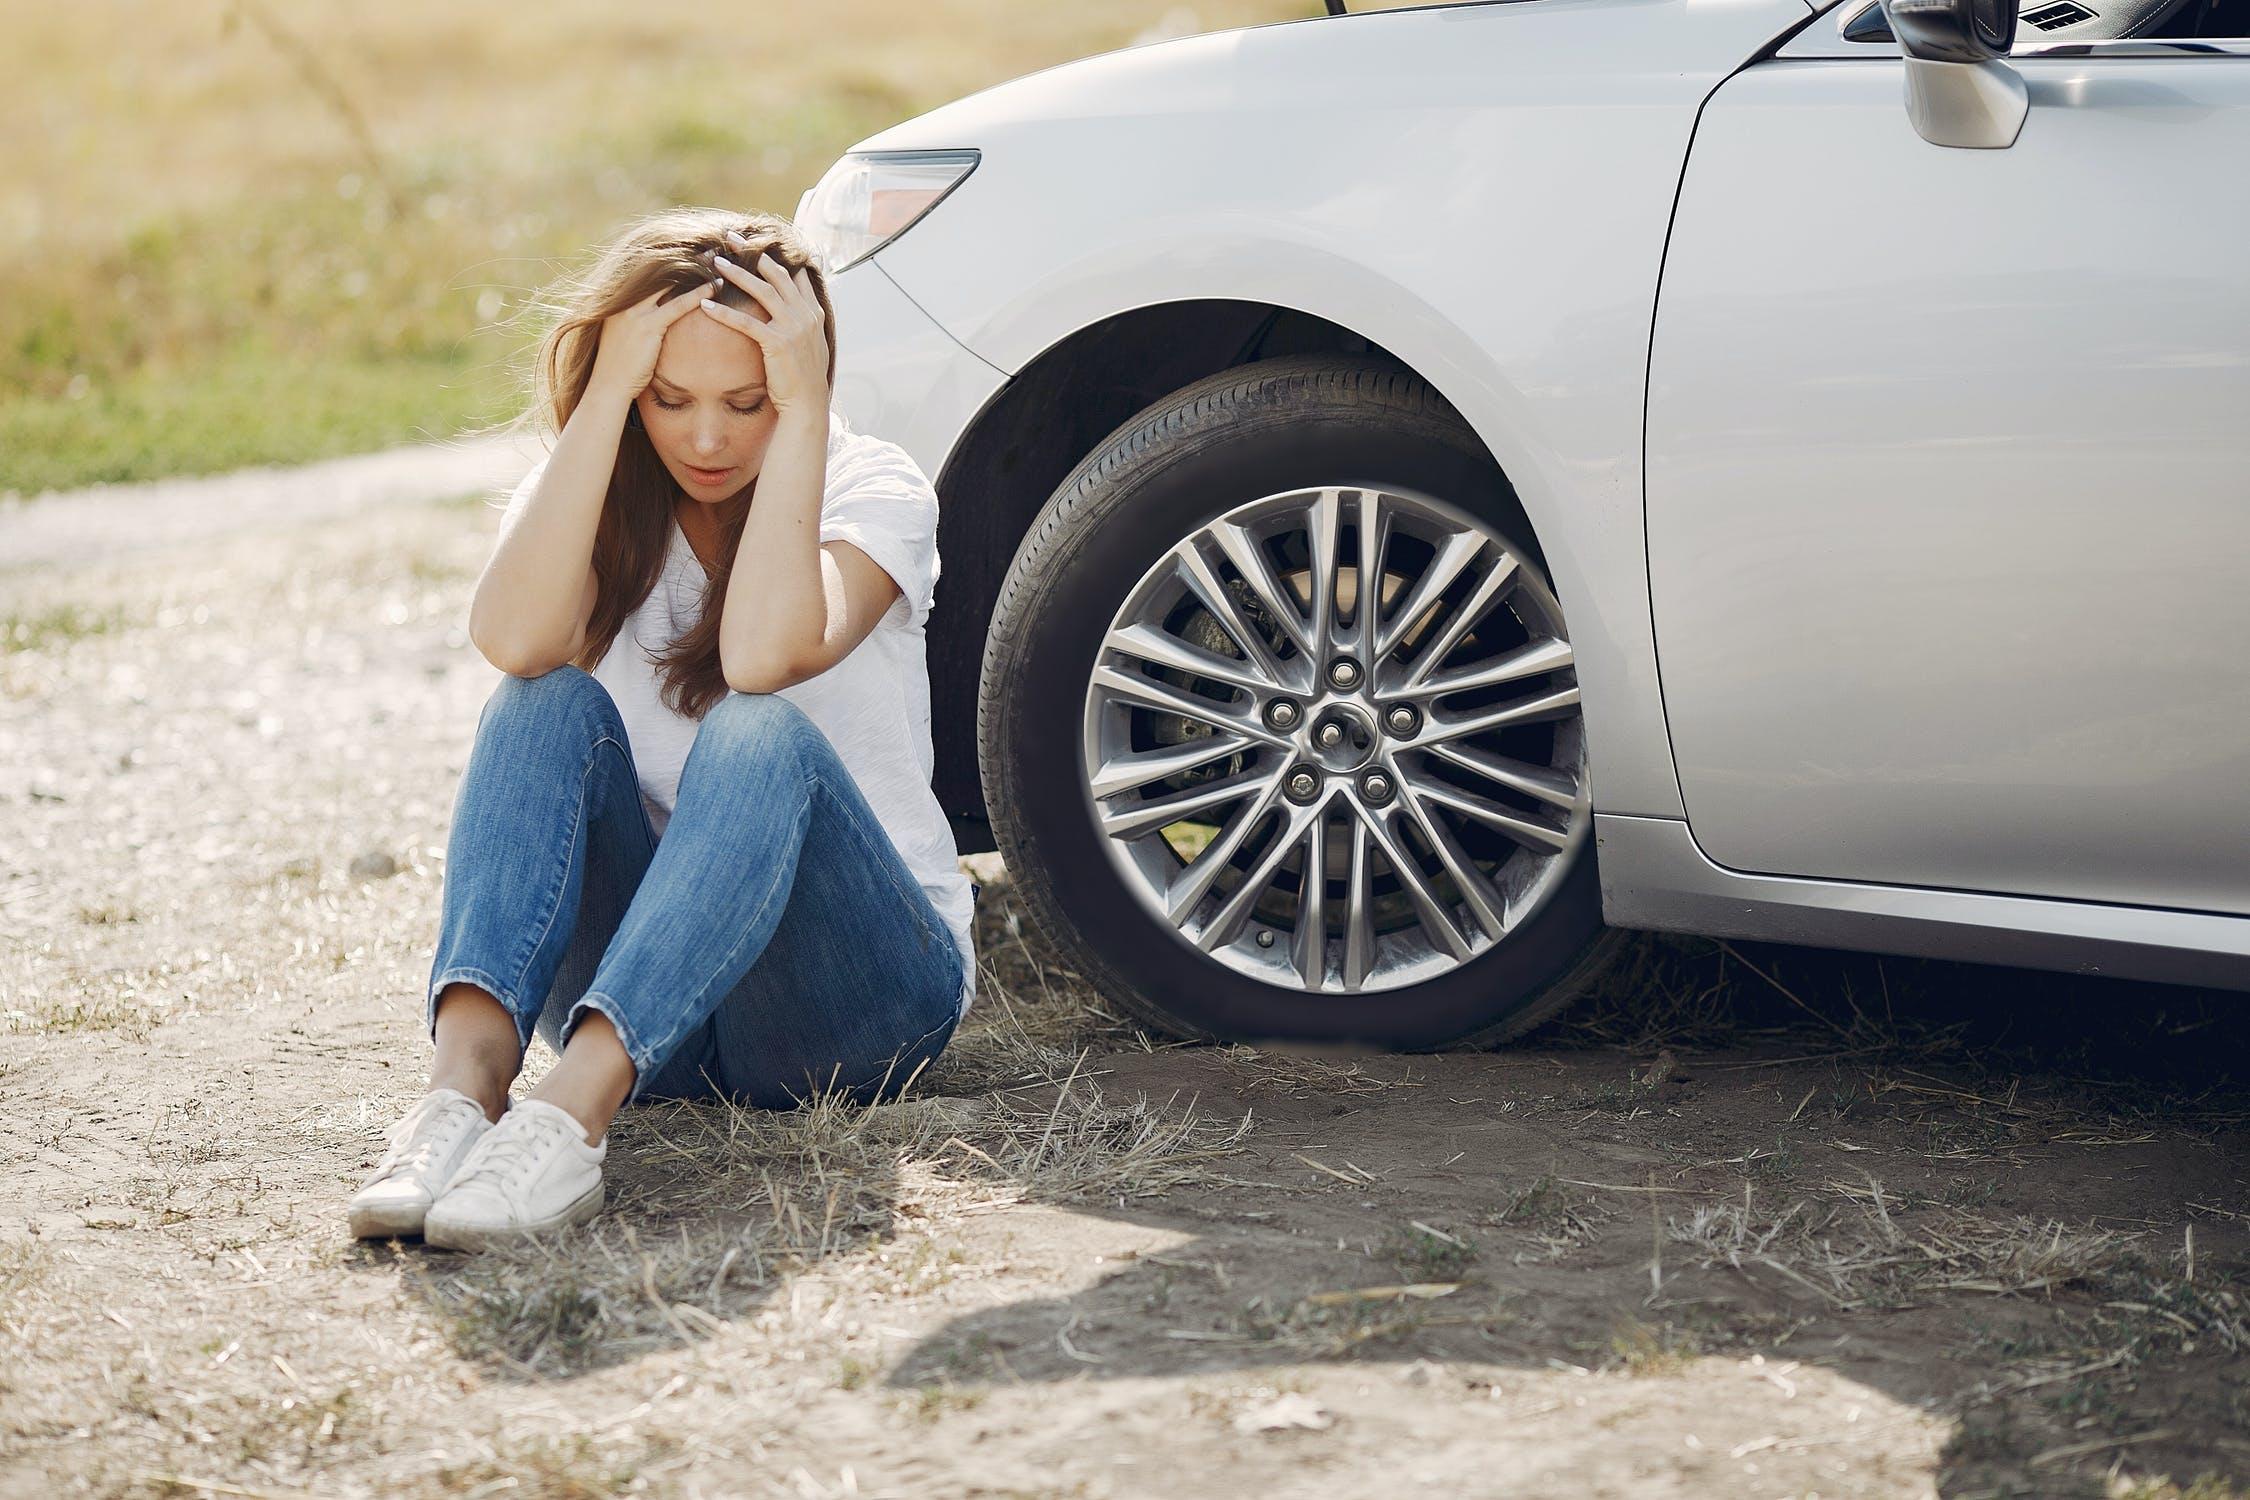 Auto Accident Chiropractor in Yuba City